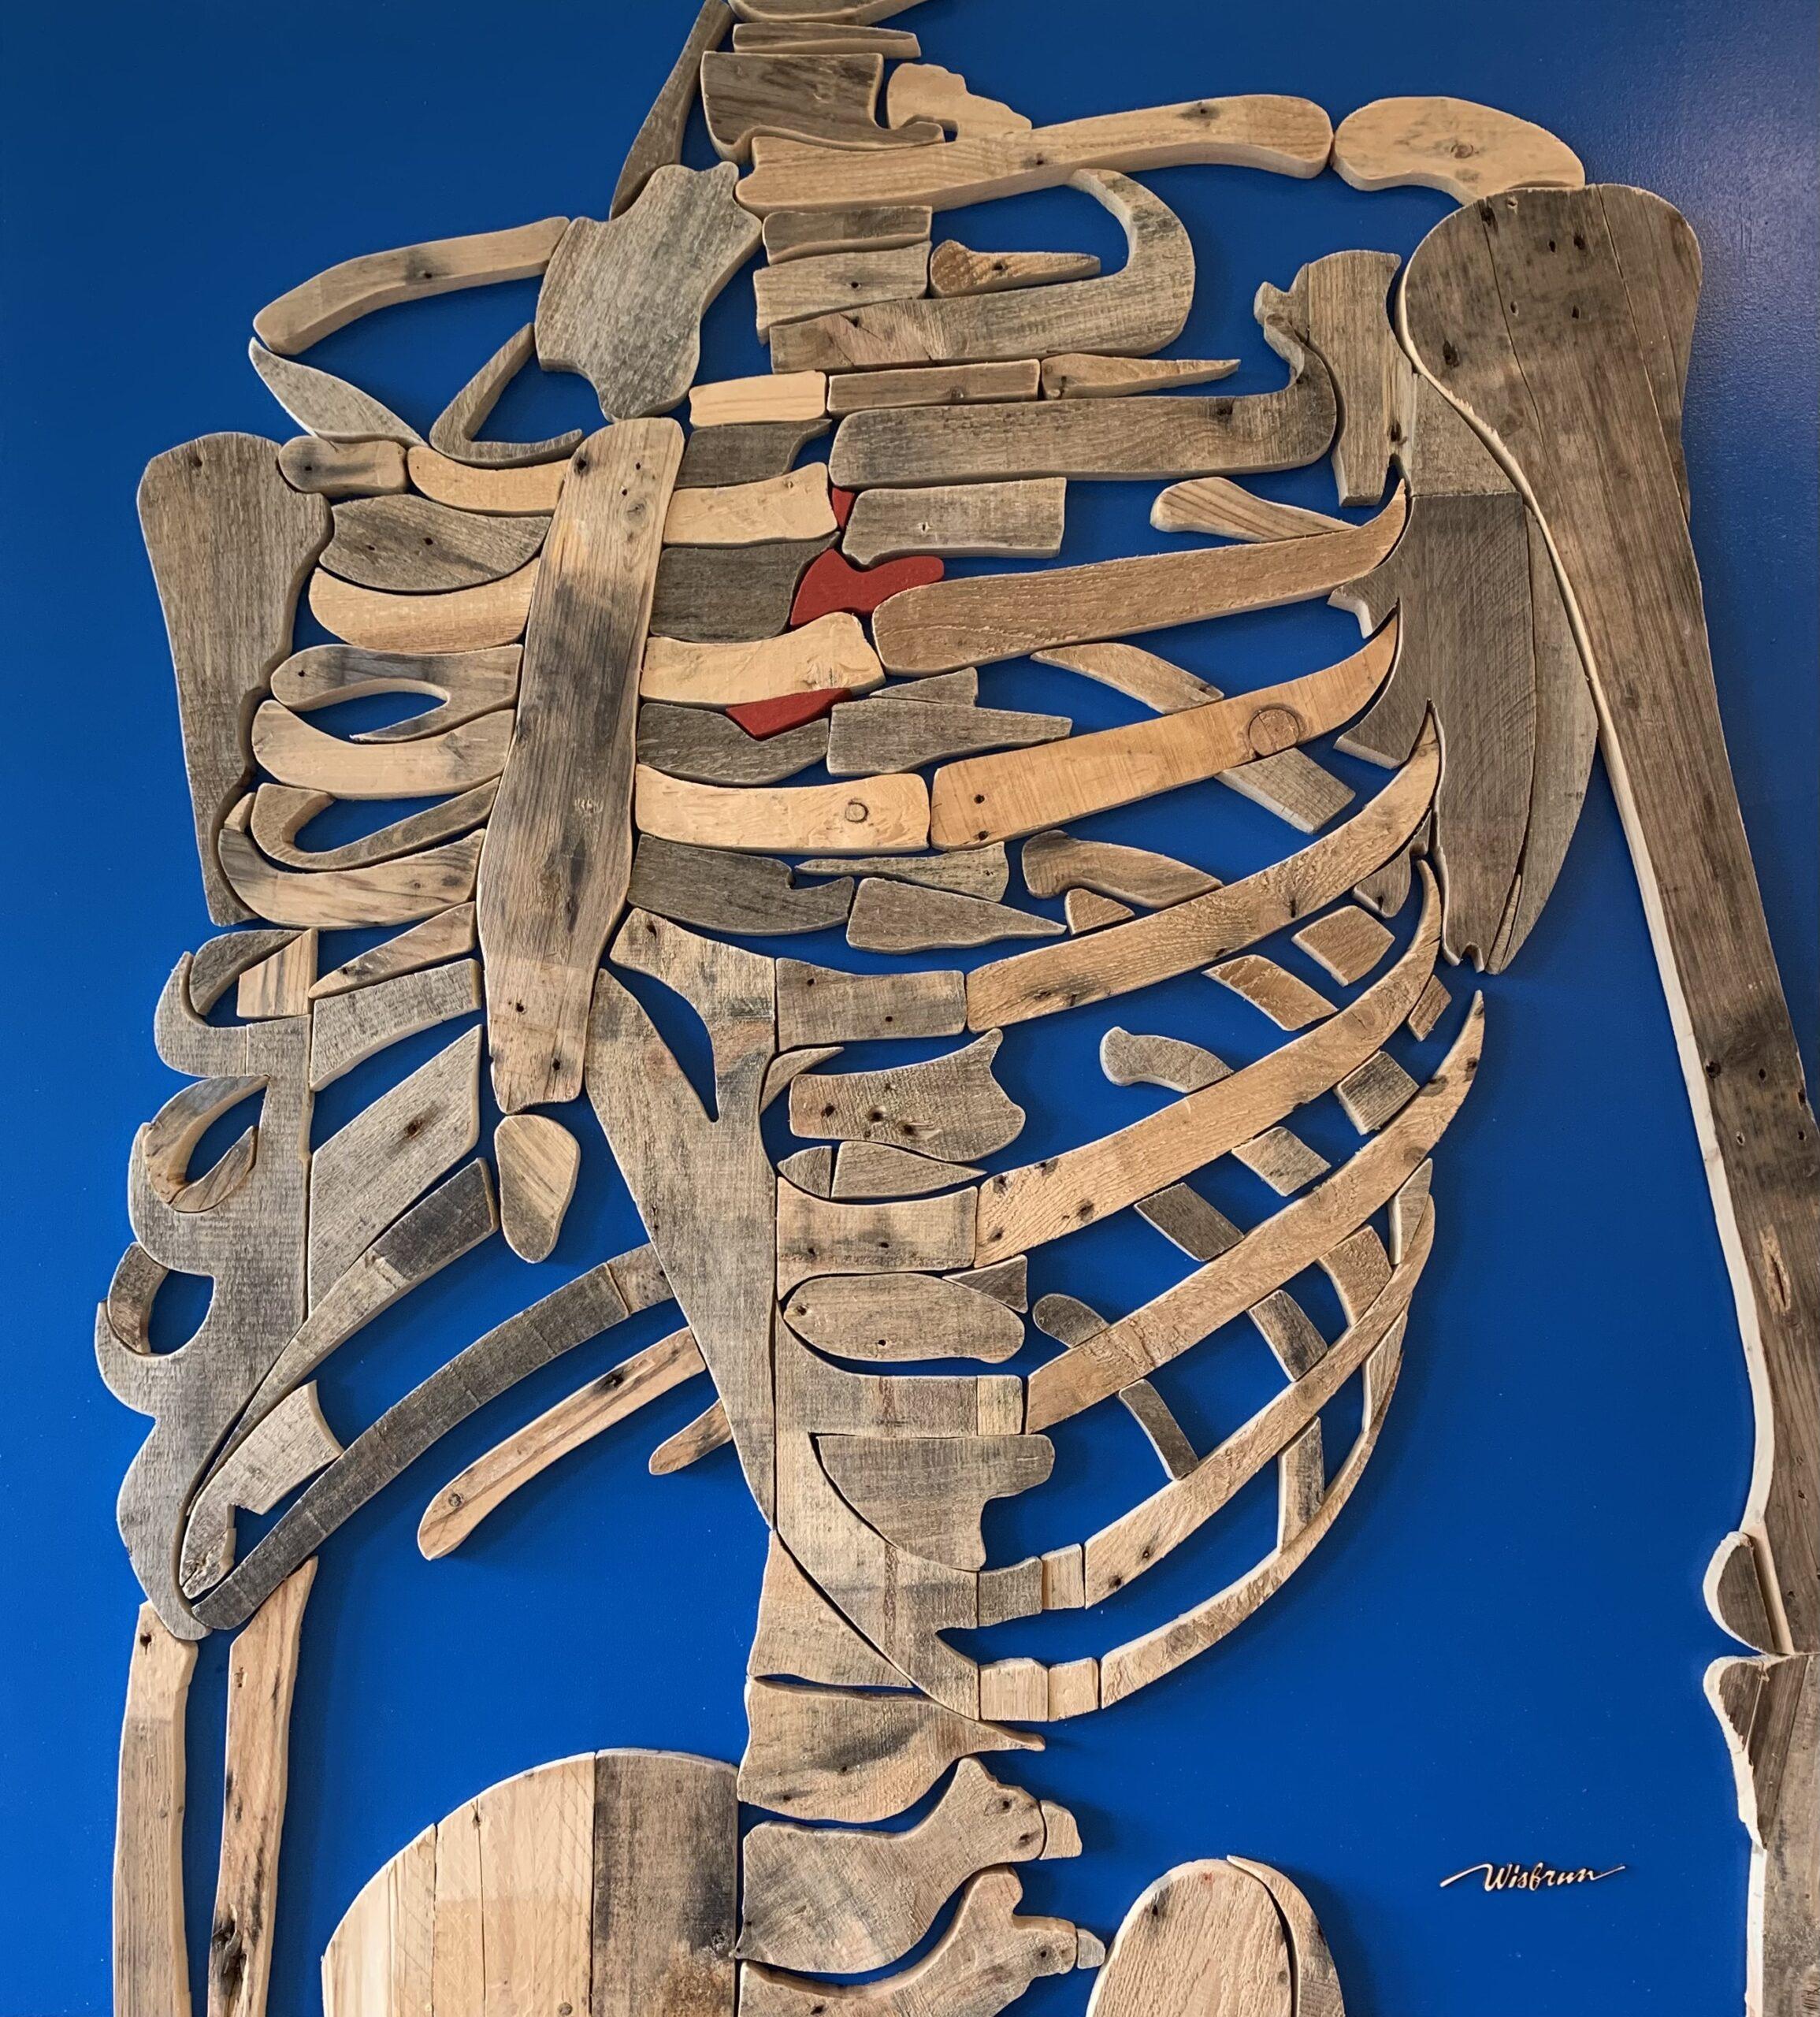 Skelet met hart - 110 x 122 cm. TE KOOP - € 2.050,-